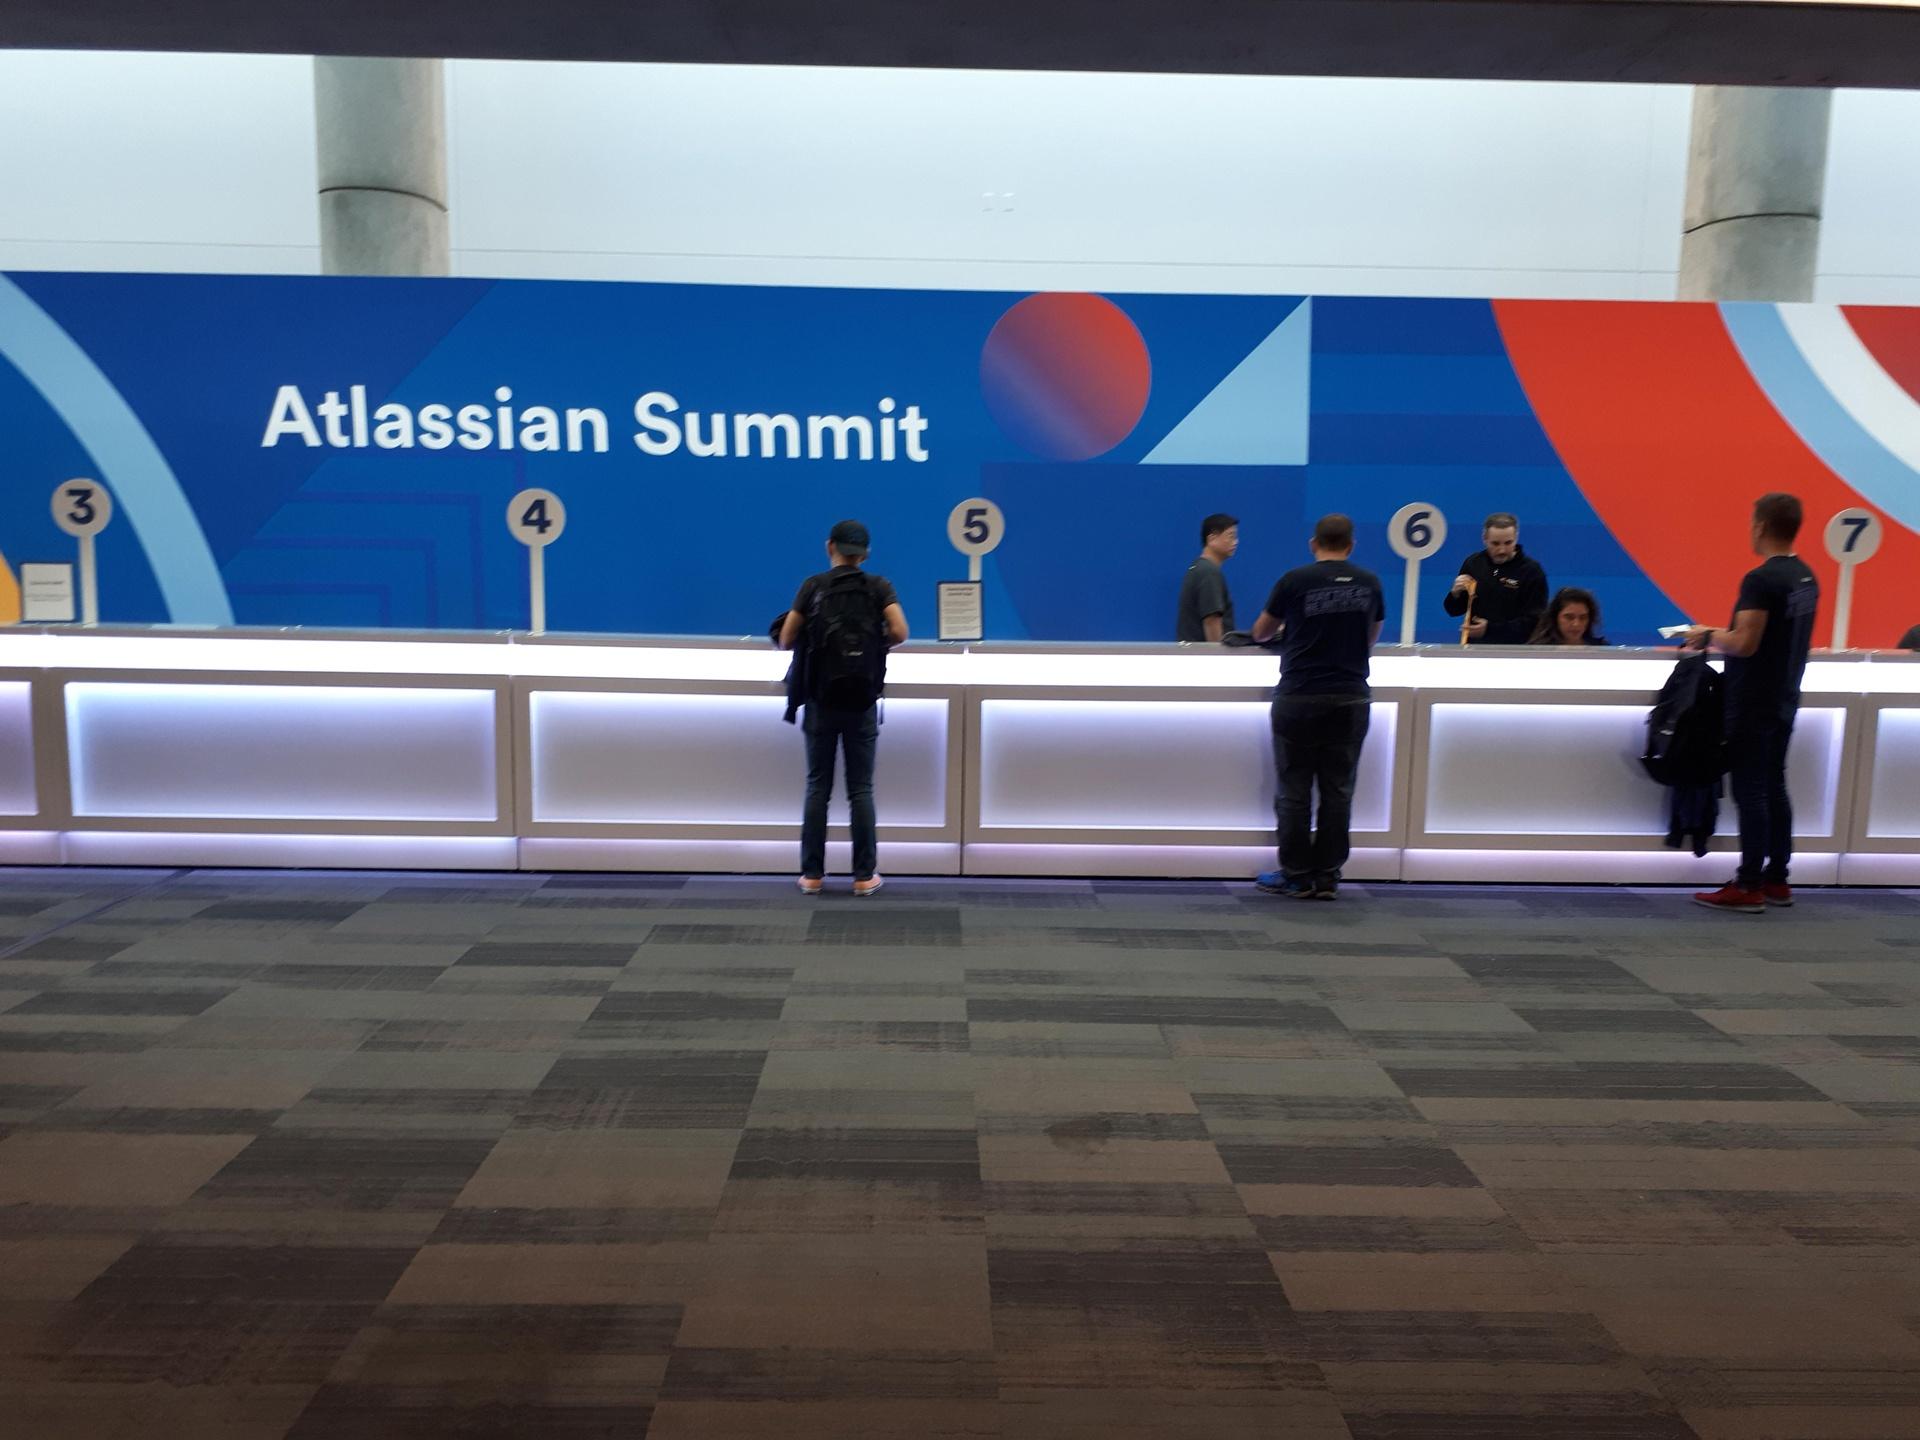 Atlassian Summit 2017 San José